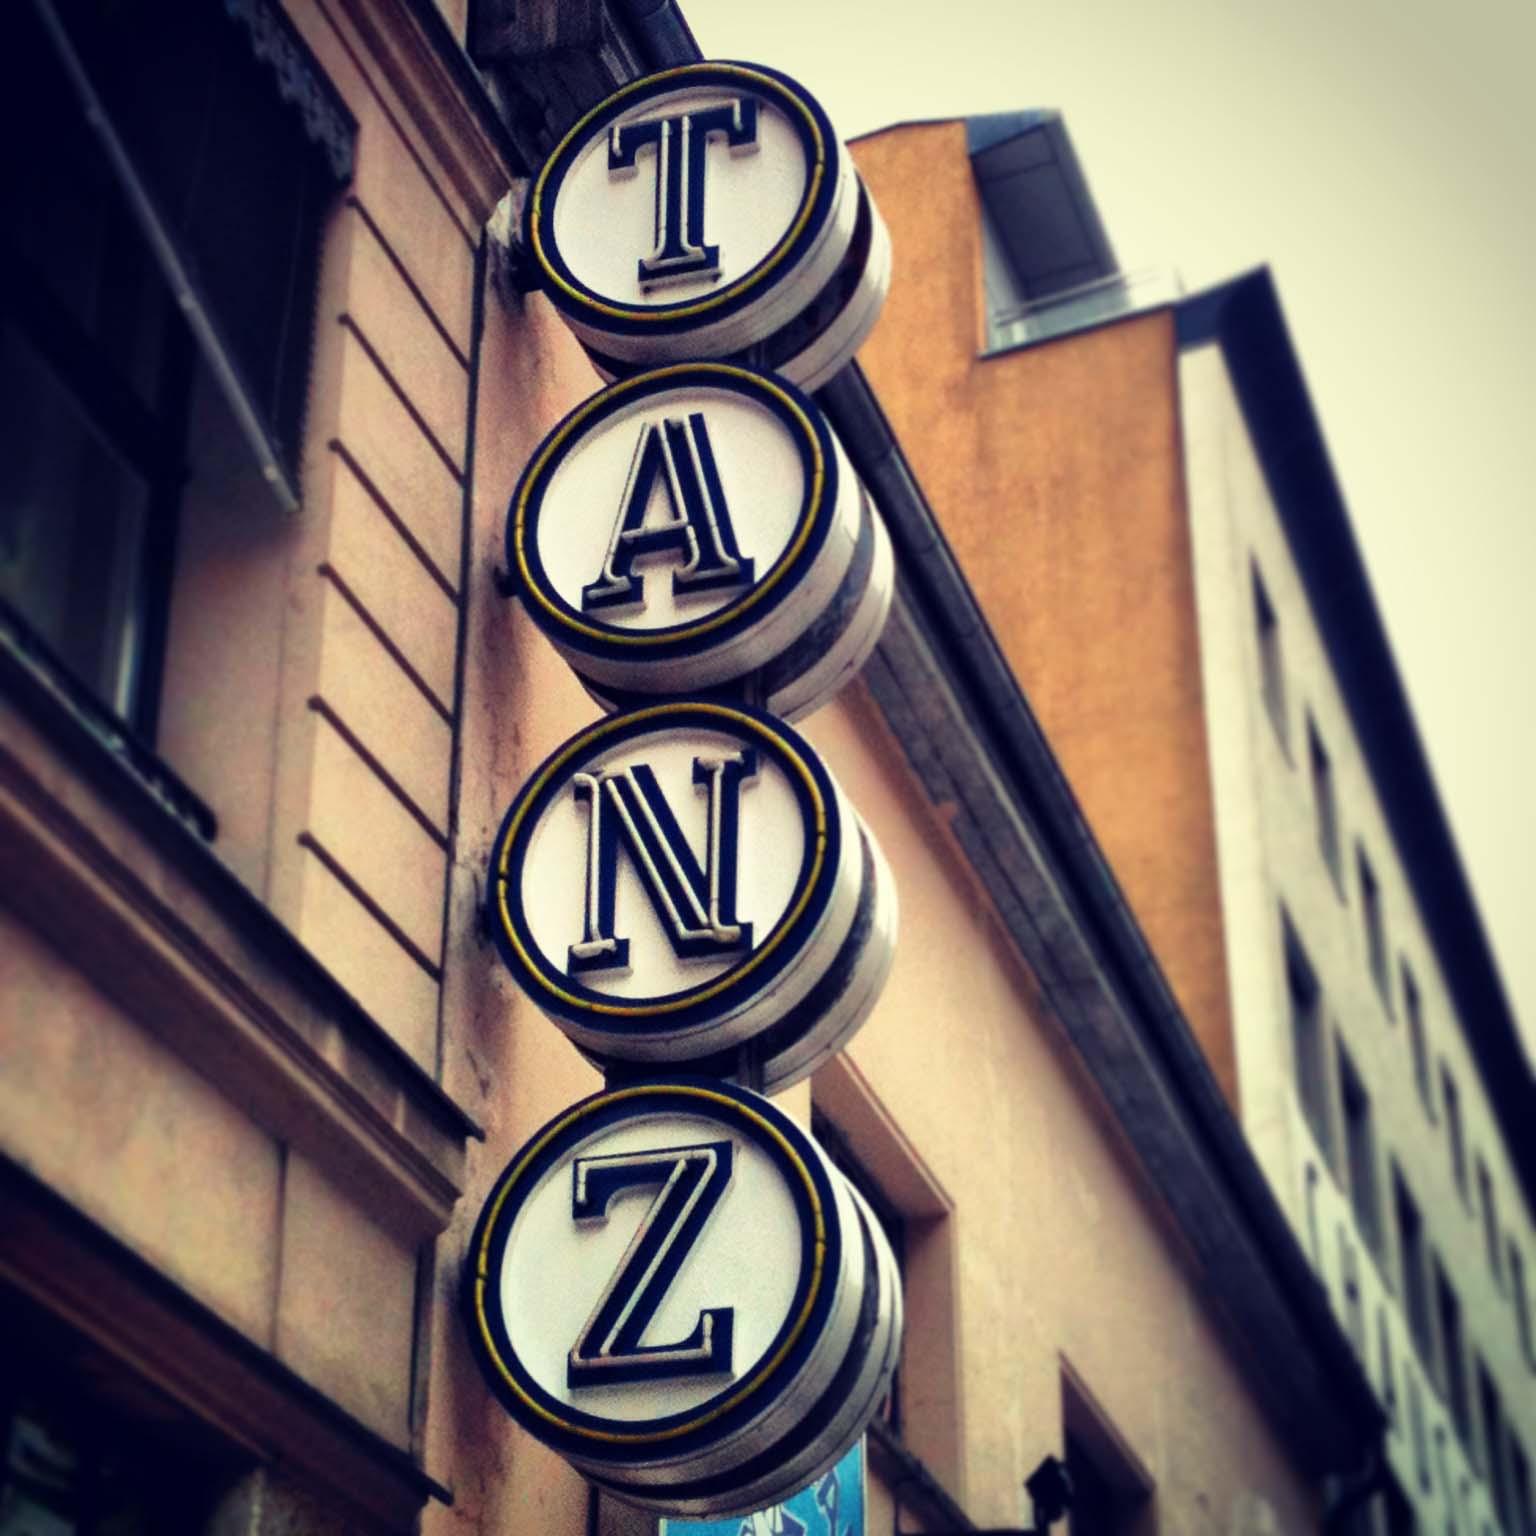 Tanz (Dance) - Sign at Hafen Bar Berlin